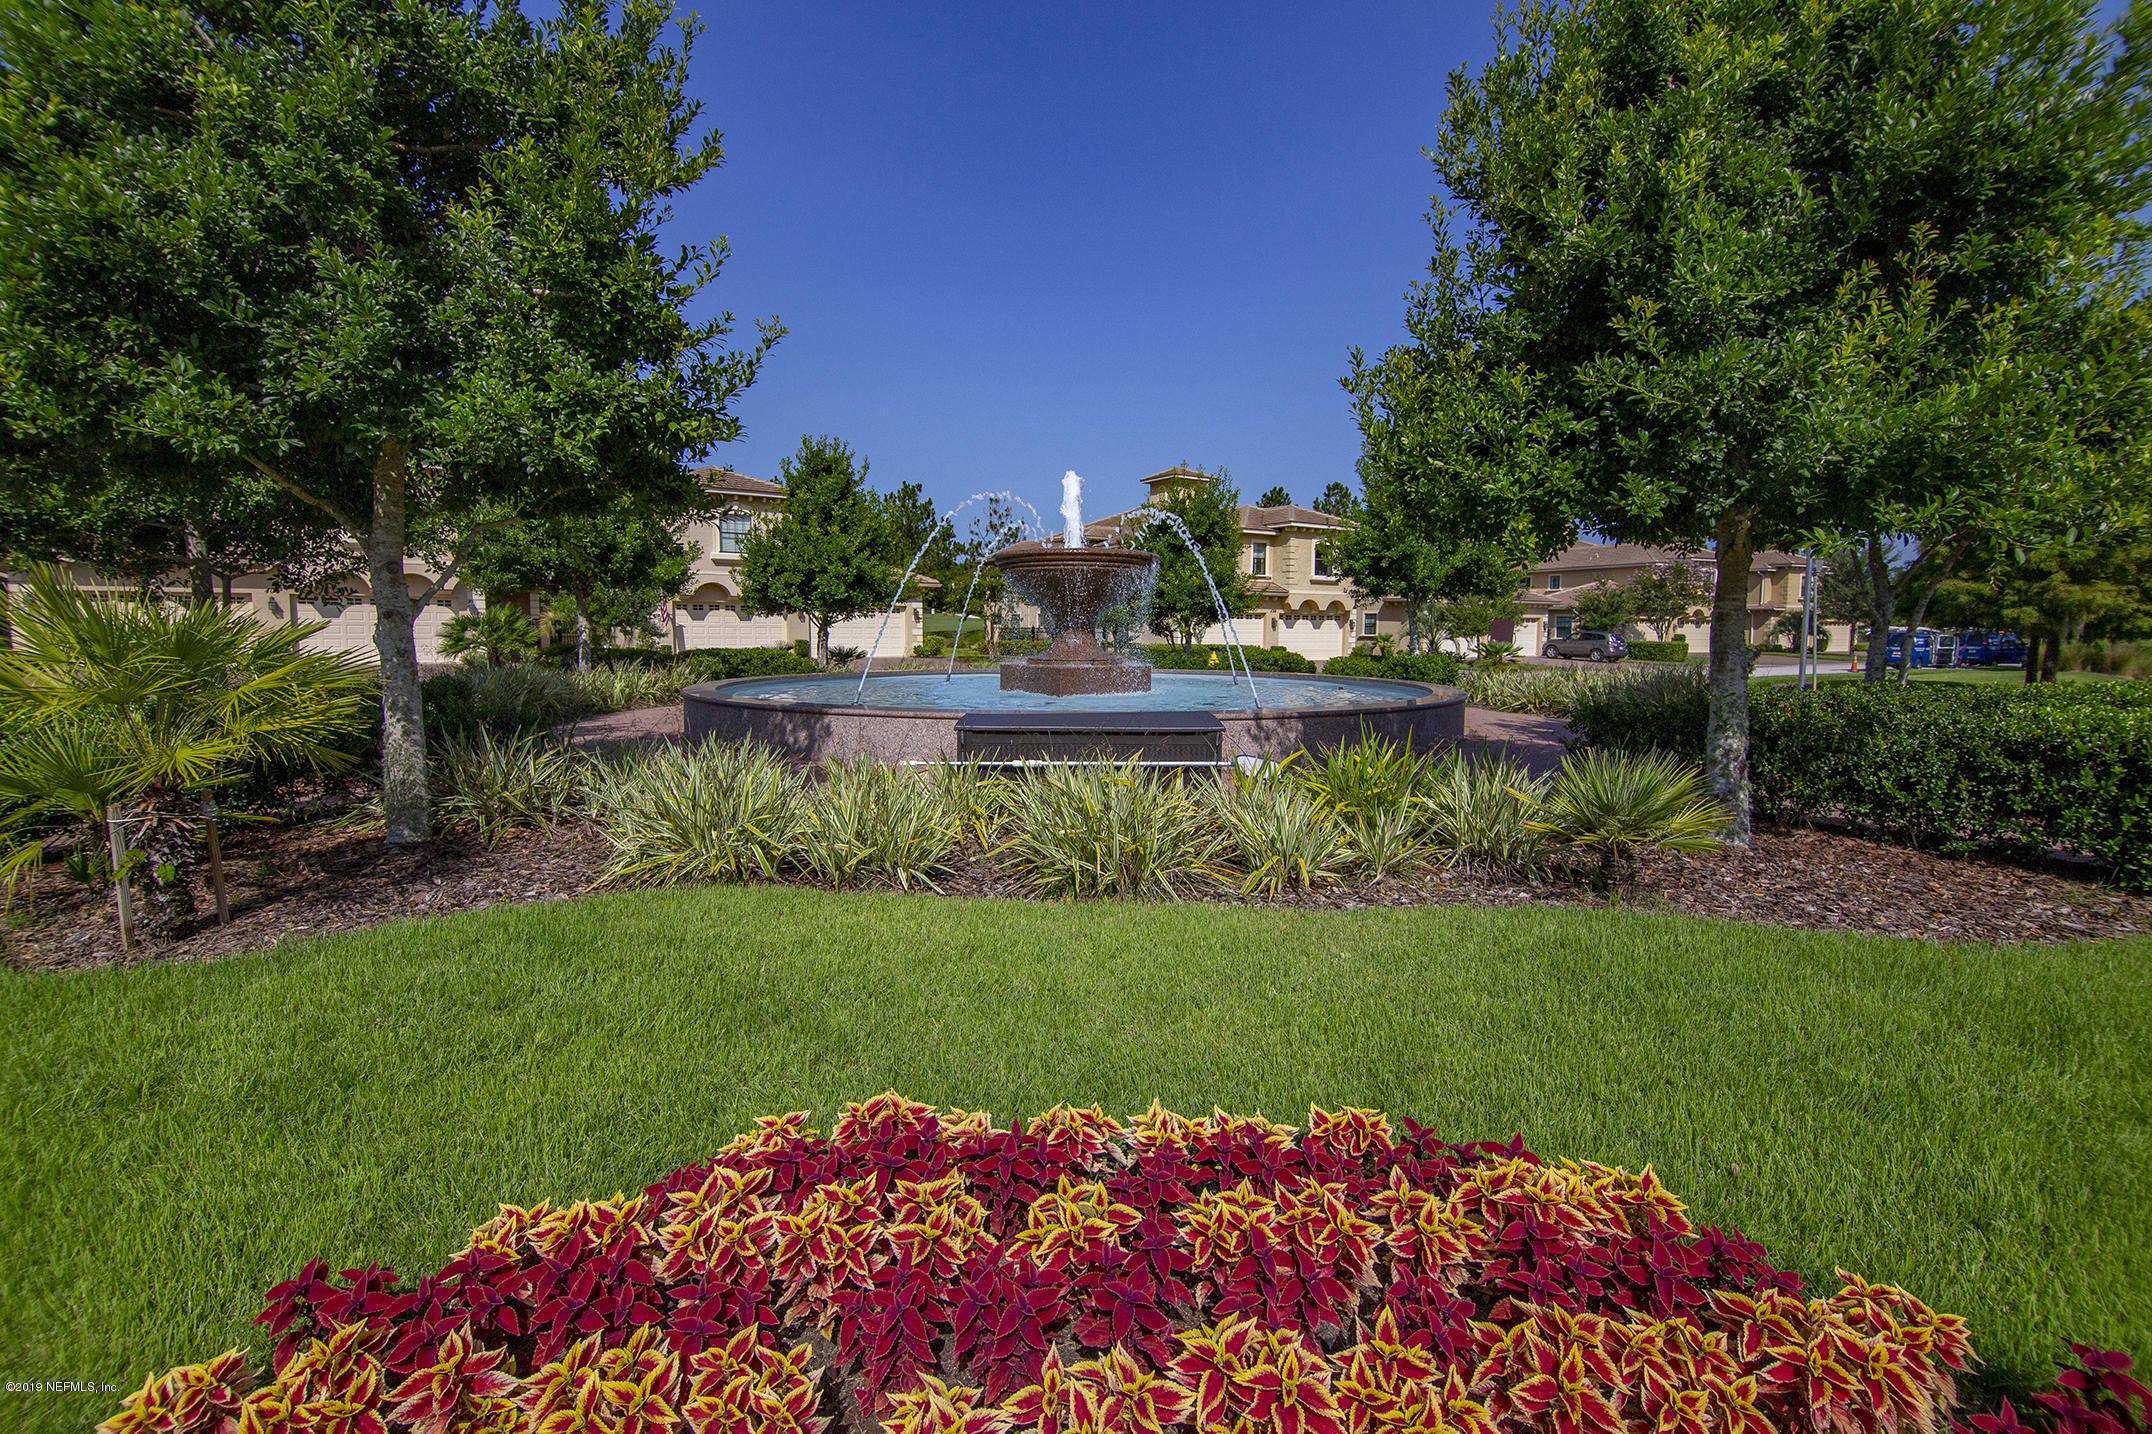 190 LATERRA LINKS, ST AUGUSTINE, FLORIDA 32092, 2 Bedrooms Bedrooms, ,2 BathroomsBathrooms,Condo,For sale,LATERRA LINKS,1006418